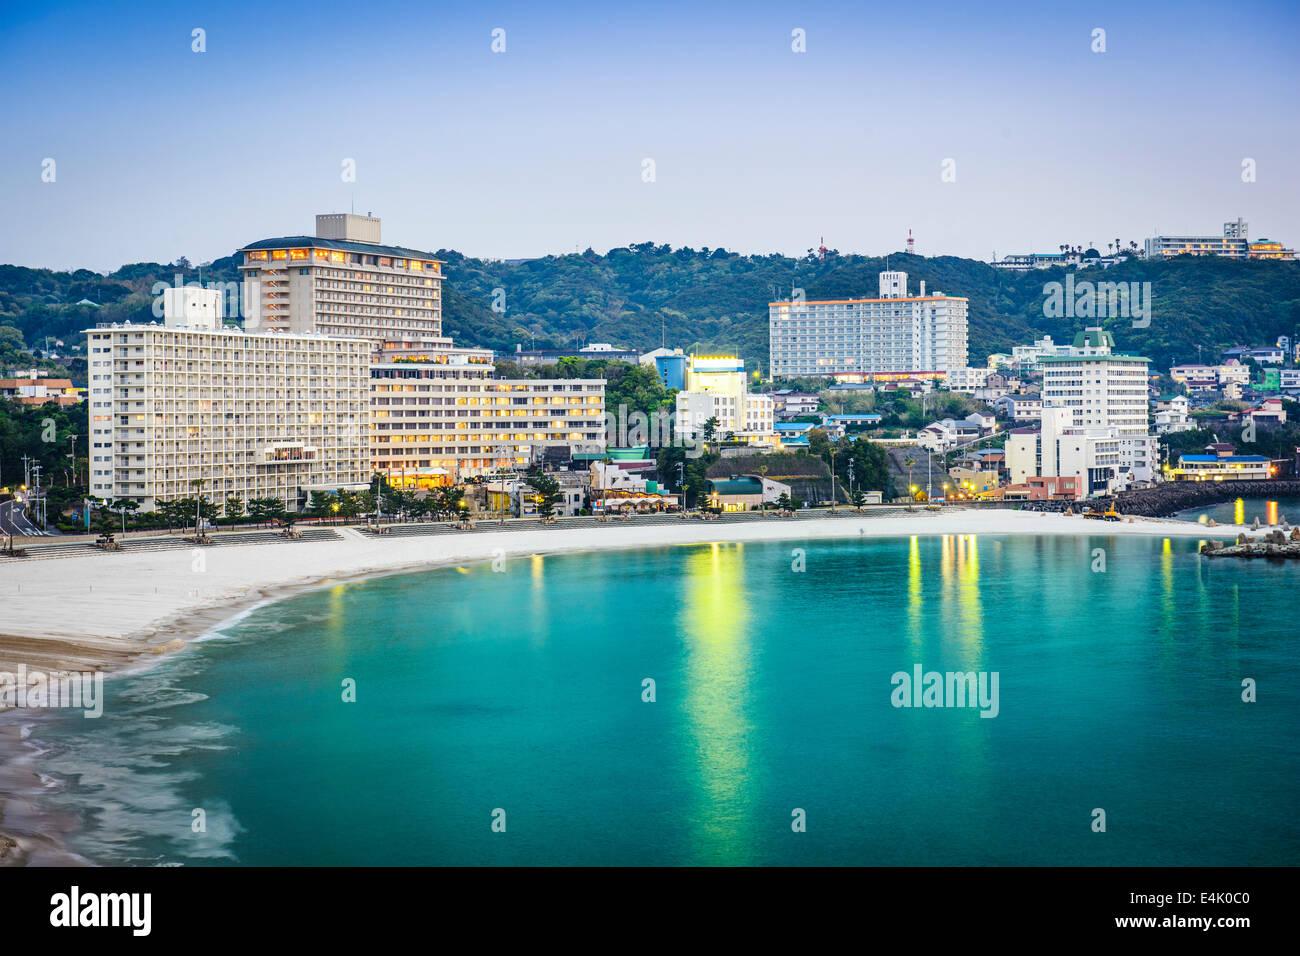 Shirahama, Japan skyline at the beachfront resorts. - Stock Image